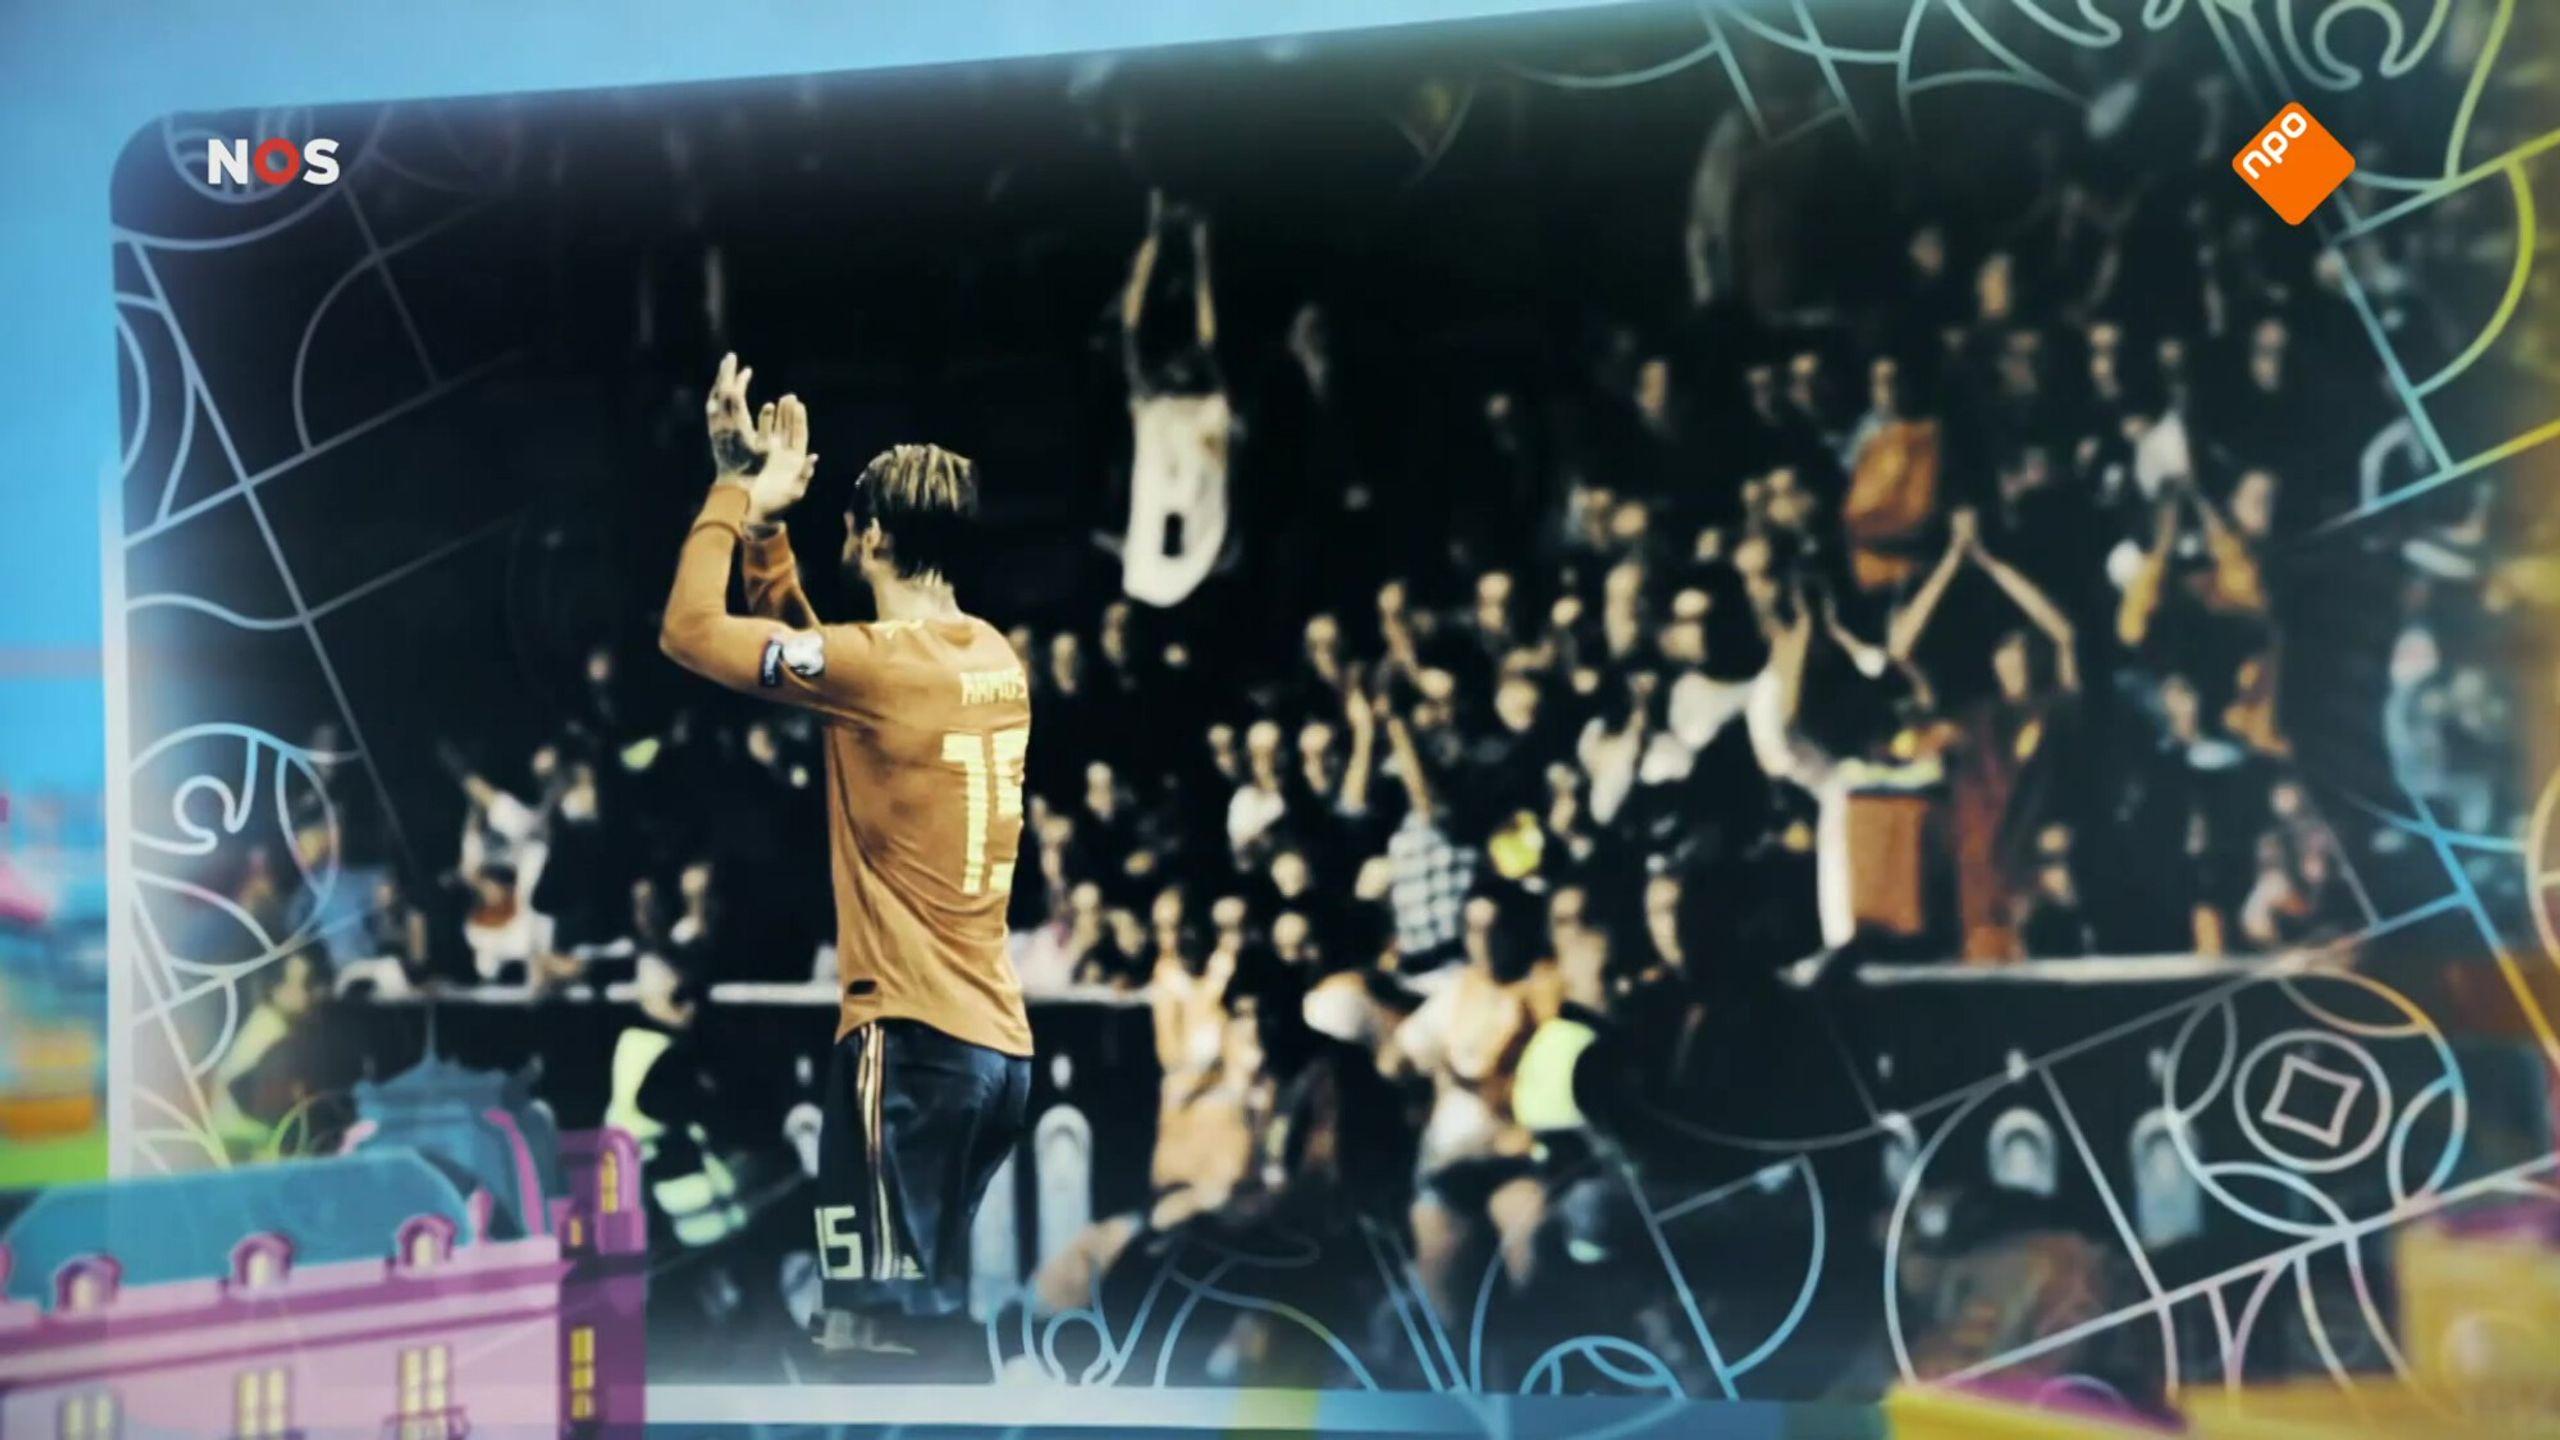 NOS Studio Sport EK Magazine